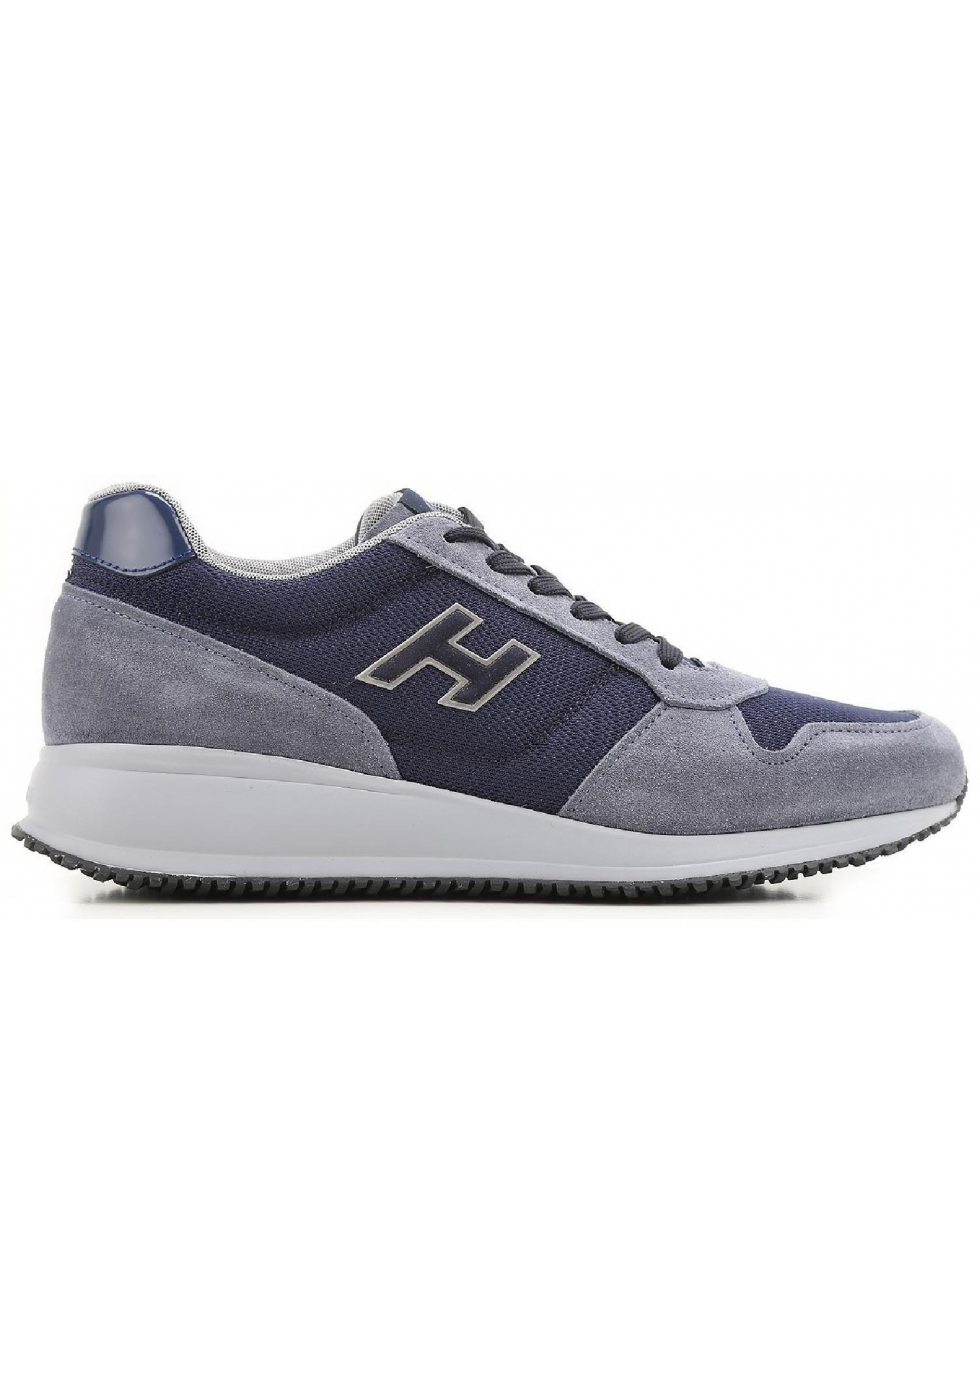 Hogan Interactive men's sneakers in light blue suede ... Giuseppe Zanotti Sneakers Blue